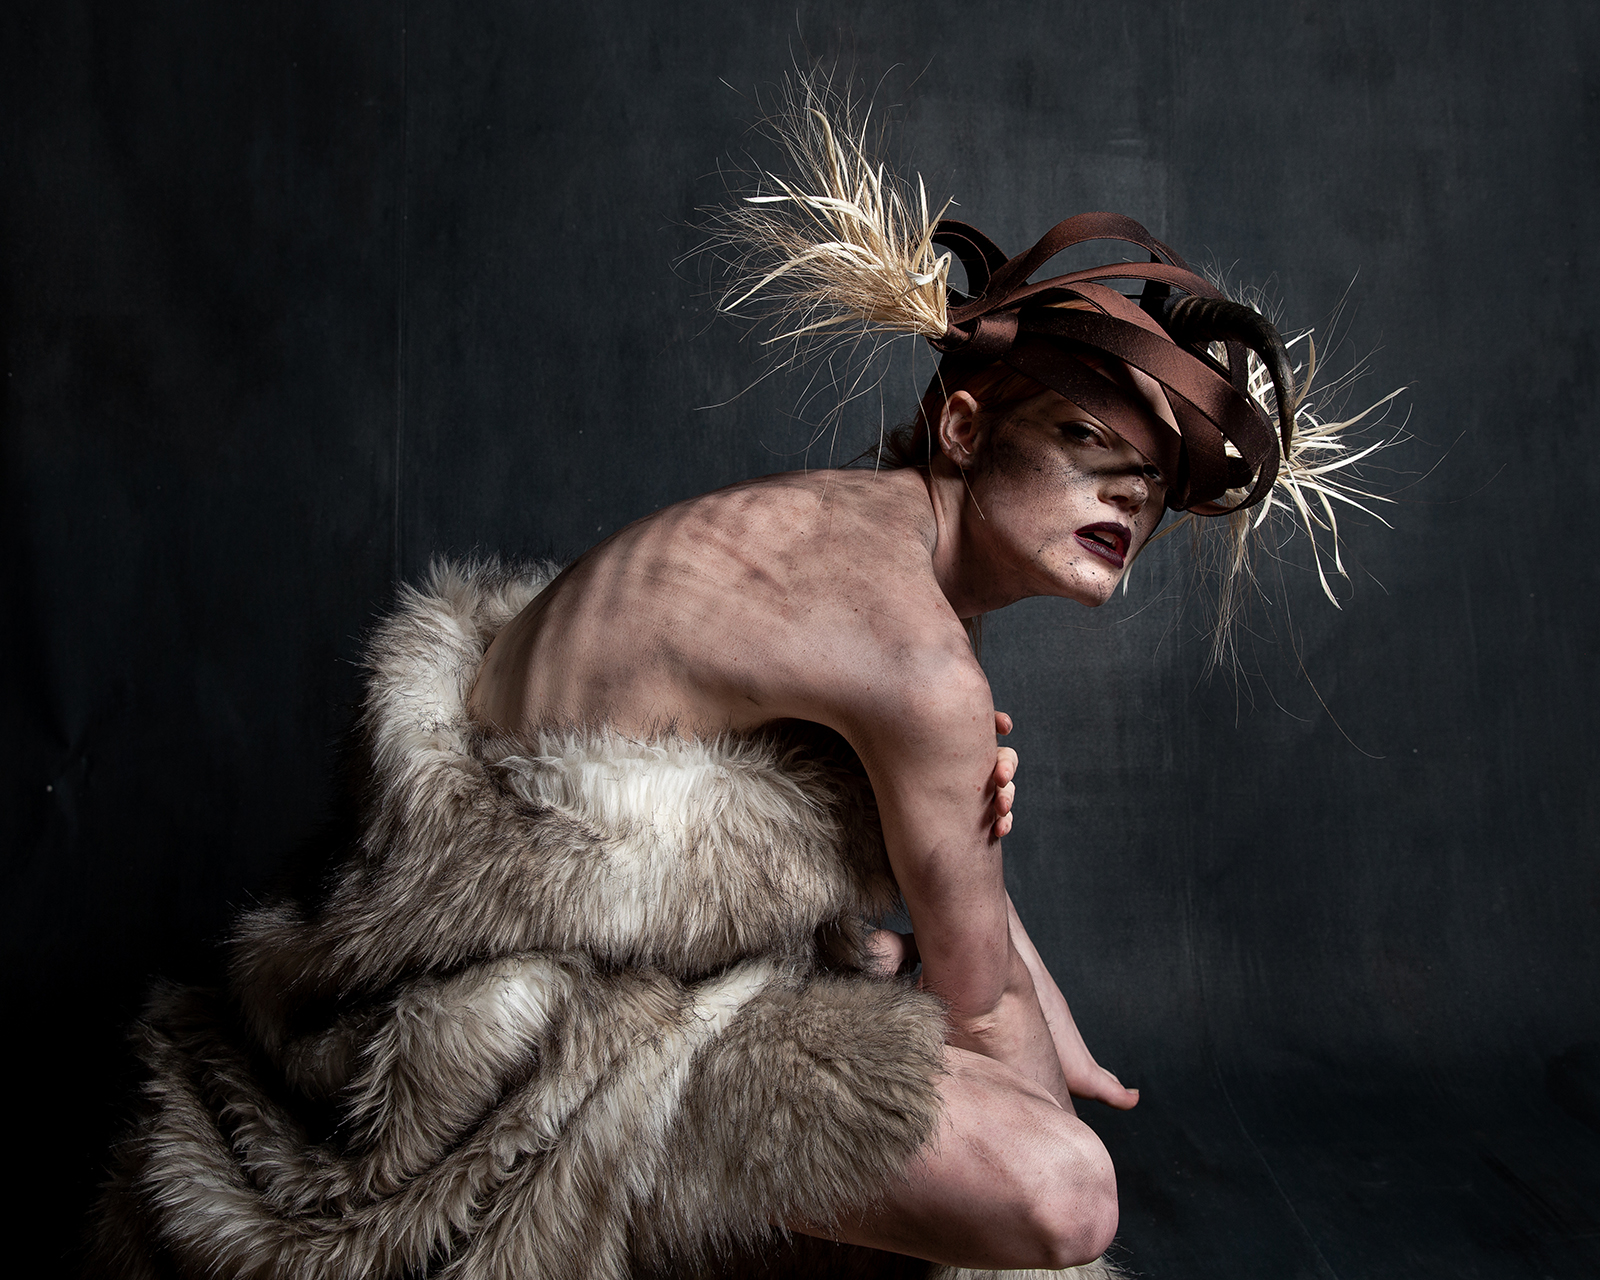 mark_and_naomi_toronto_fashion_photography_david_dunkley_dirty_horn_iii.jpg